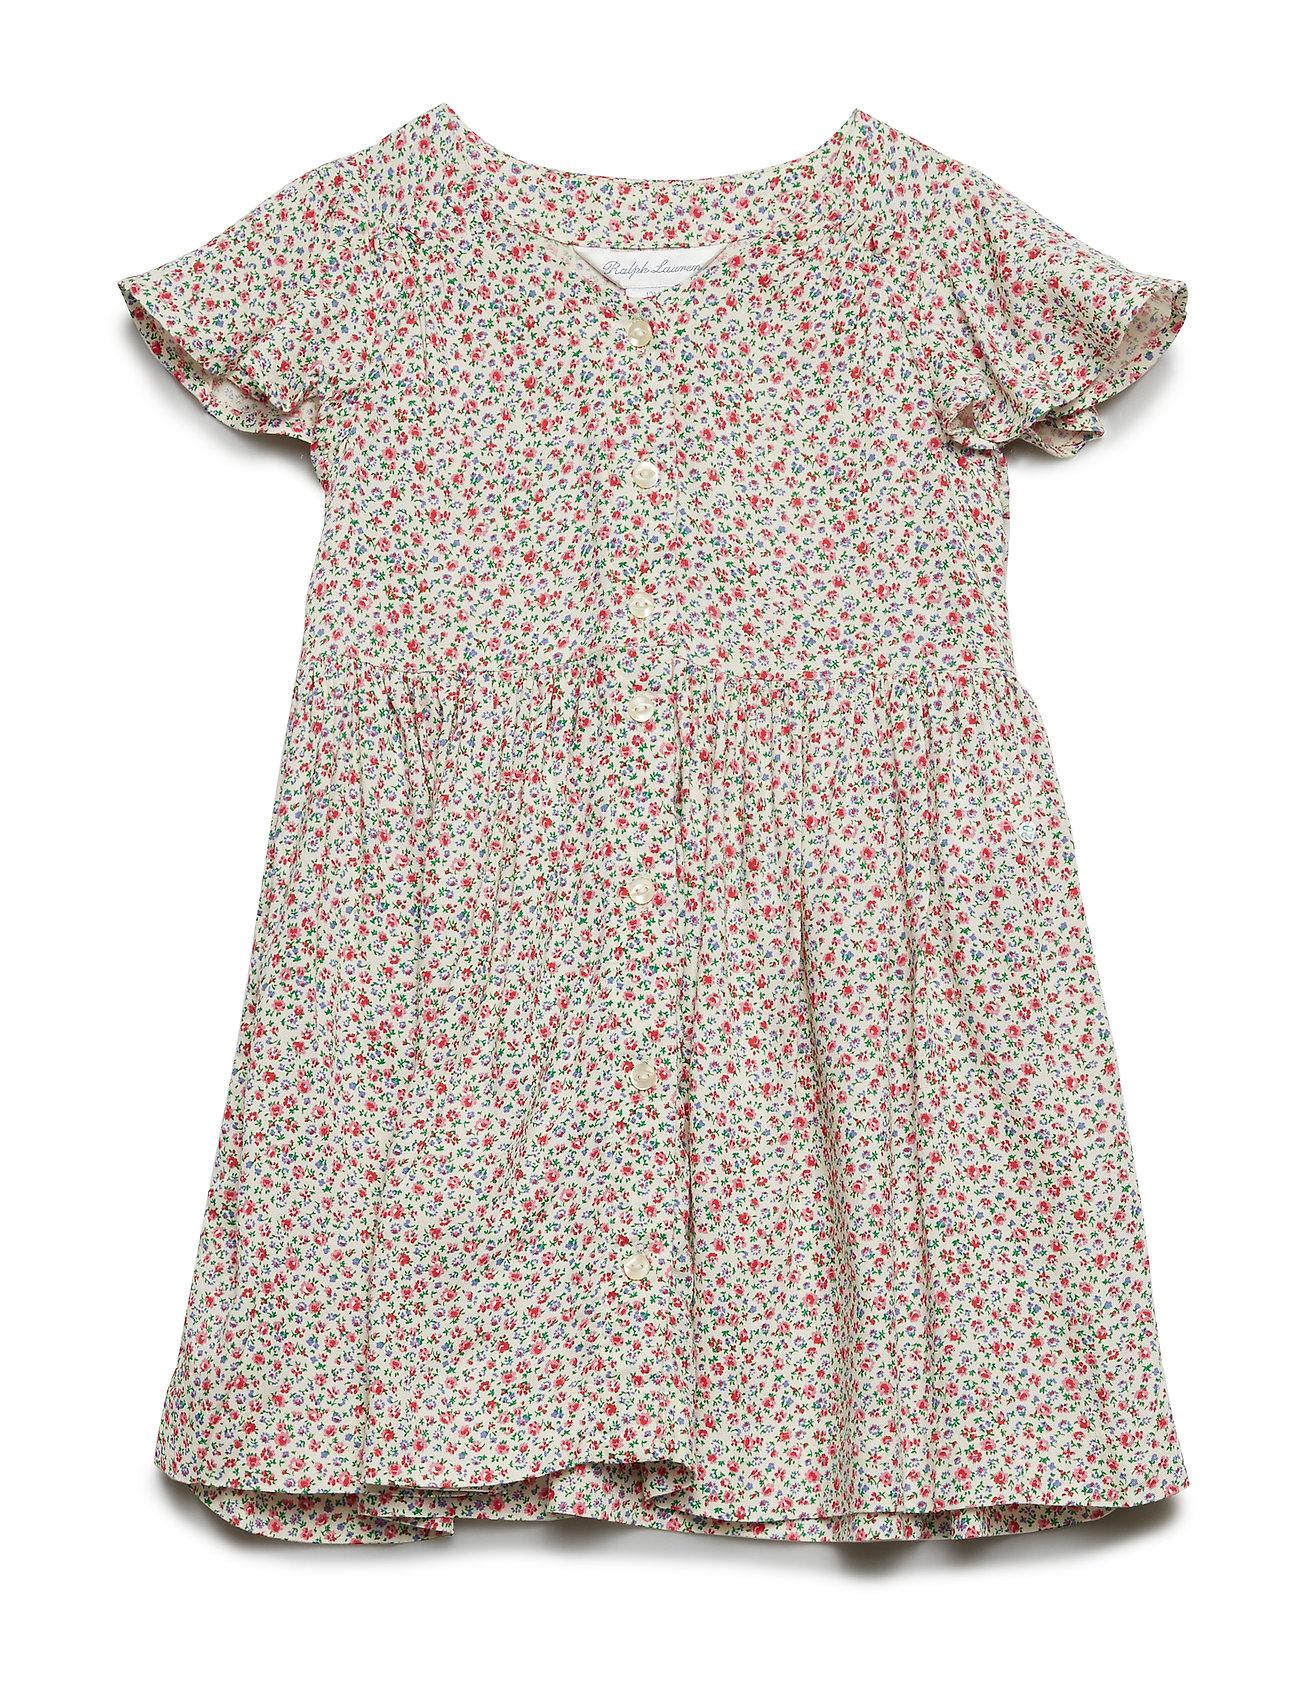 ac5deac99 Rayon-floral Dress-dr-wvn (Cream Multi) (£45.50) - Ralph Lauren Baby ...